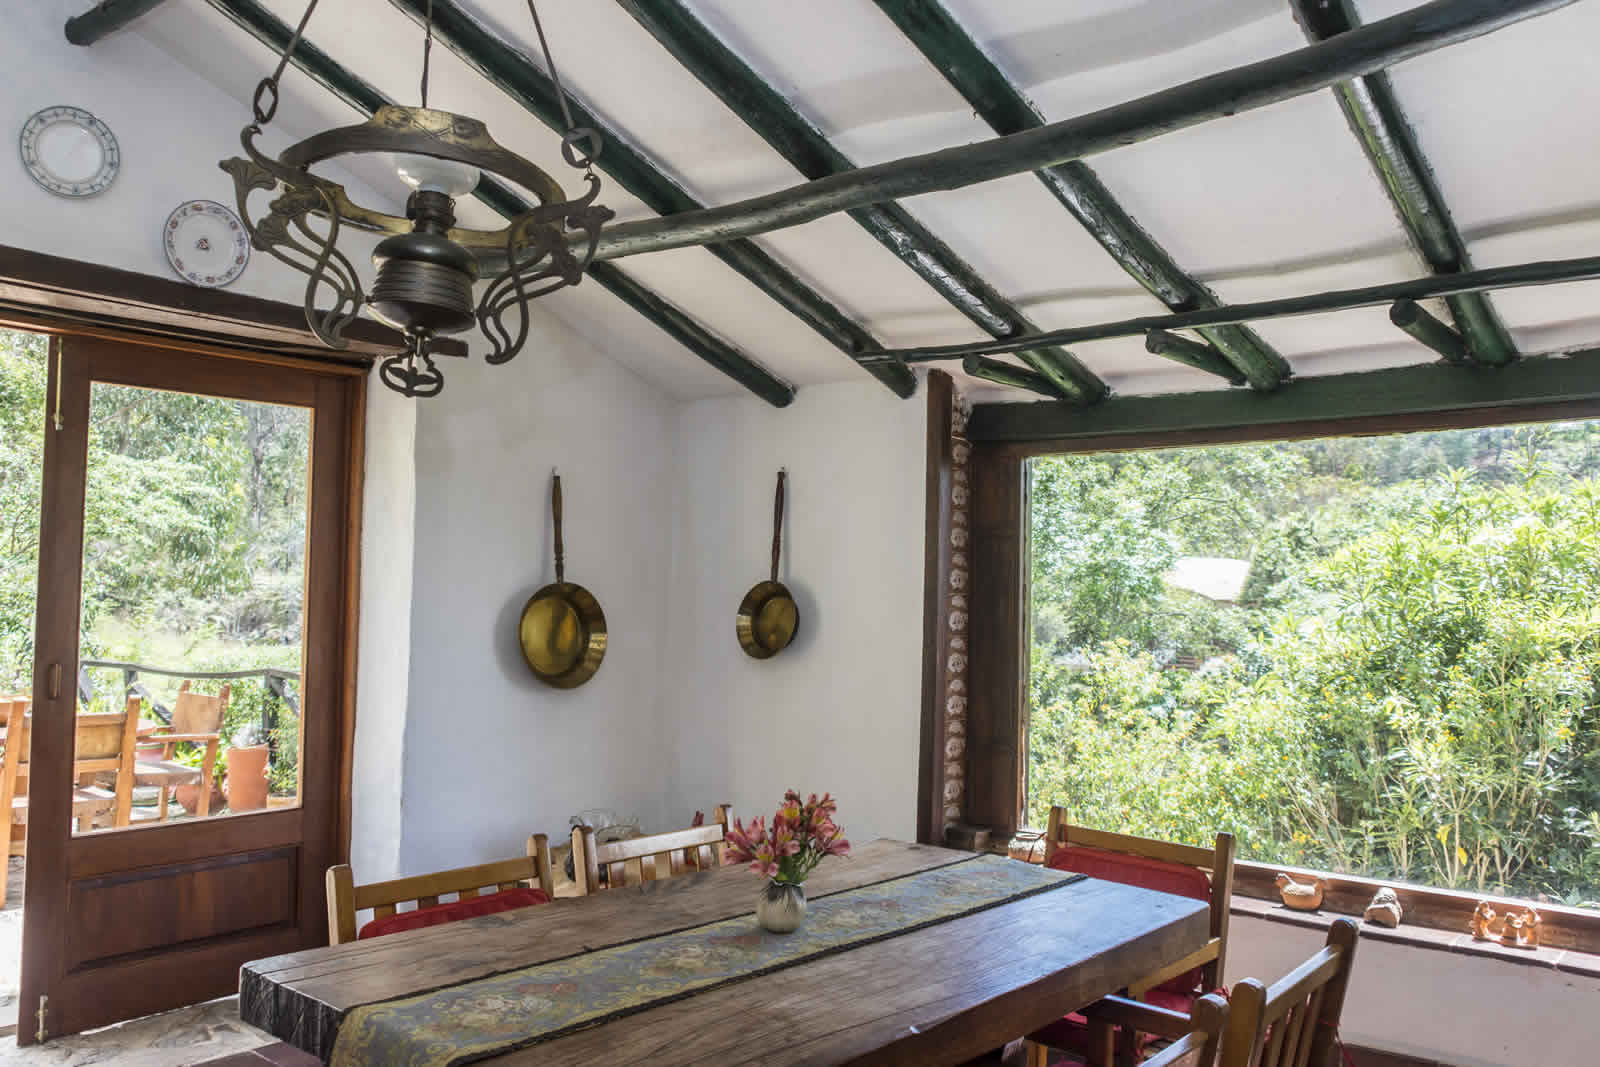 Alquiler casa Pozo Azul en Villa de Leyva - Comedor